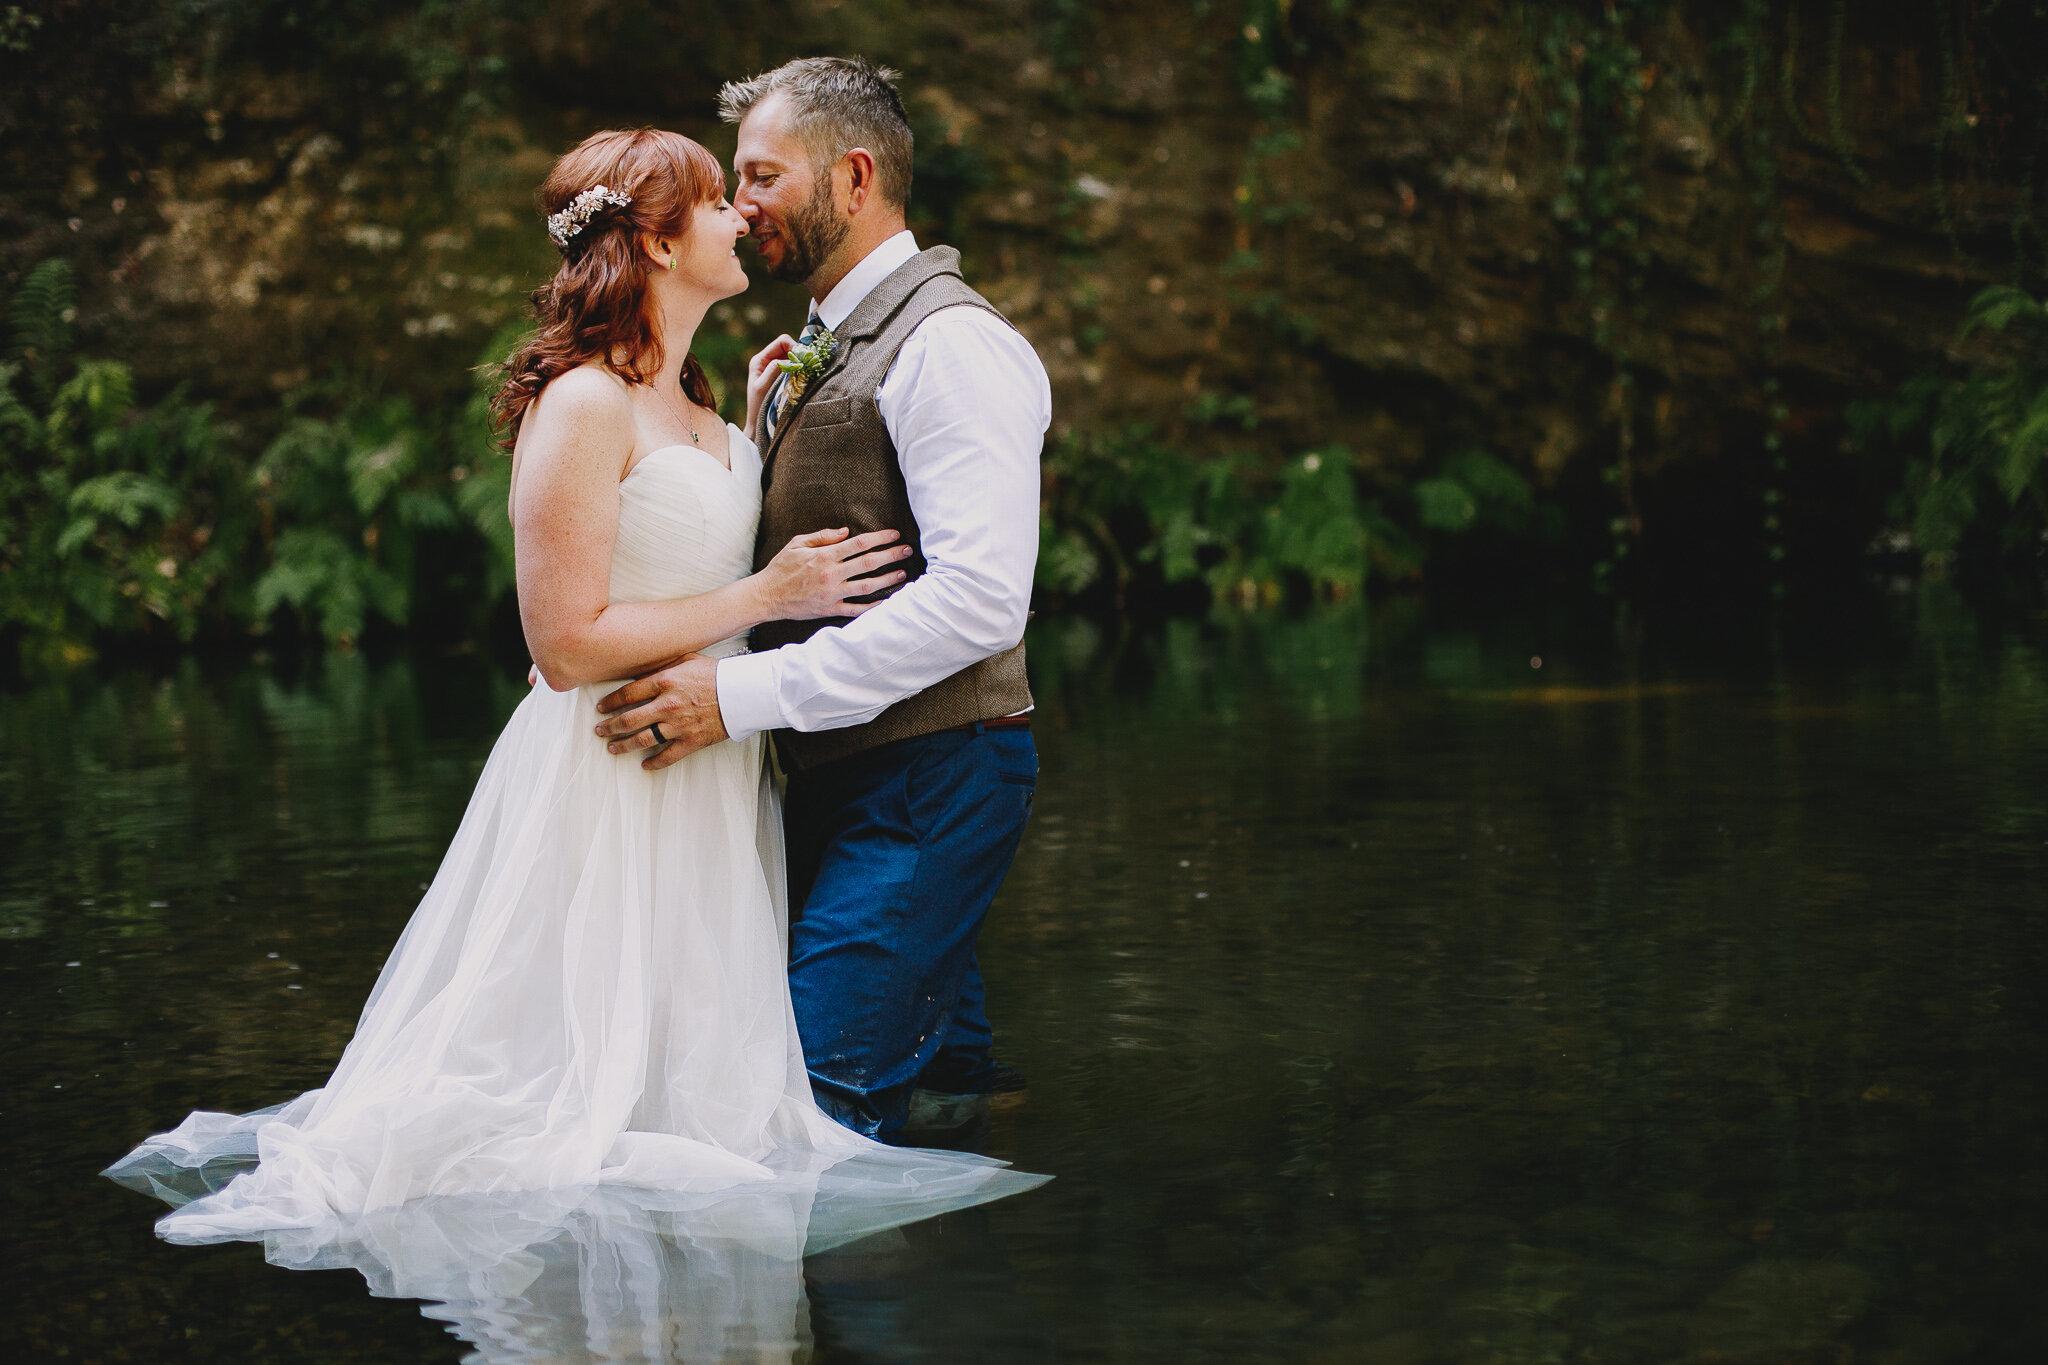 Archer Inspired Photography Portola Redwoods Elopement Wedding-5.jpg